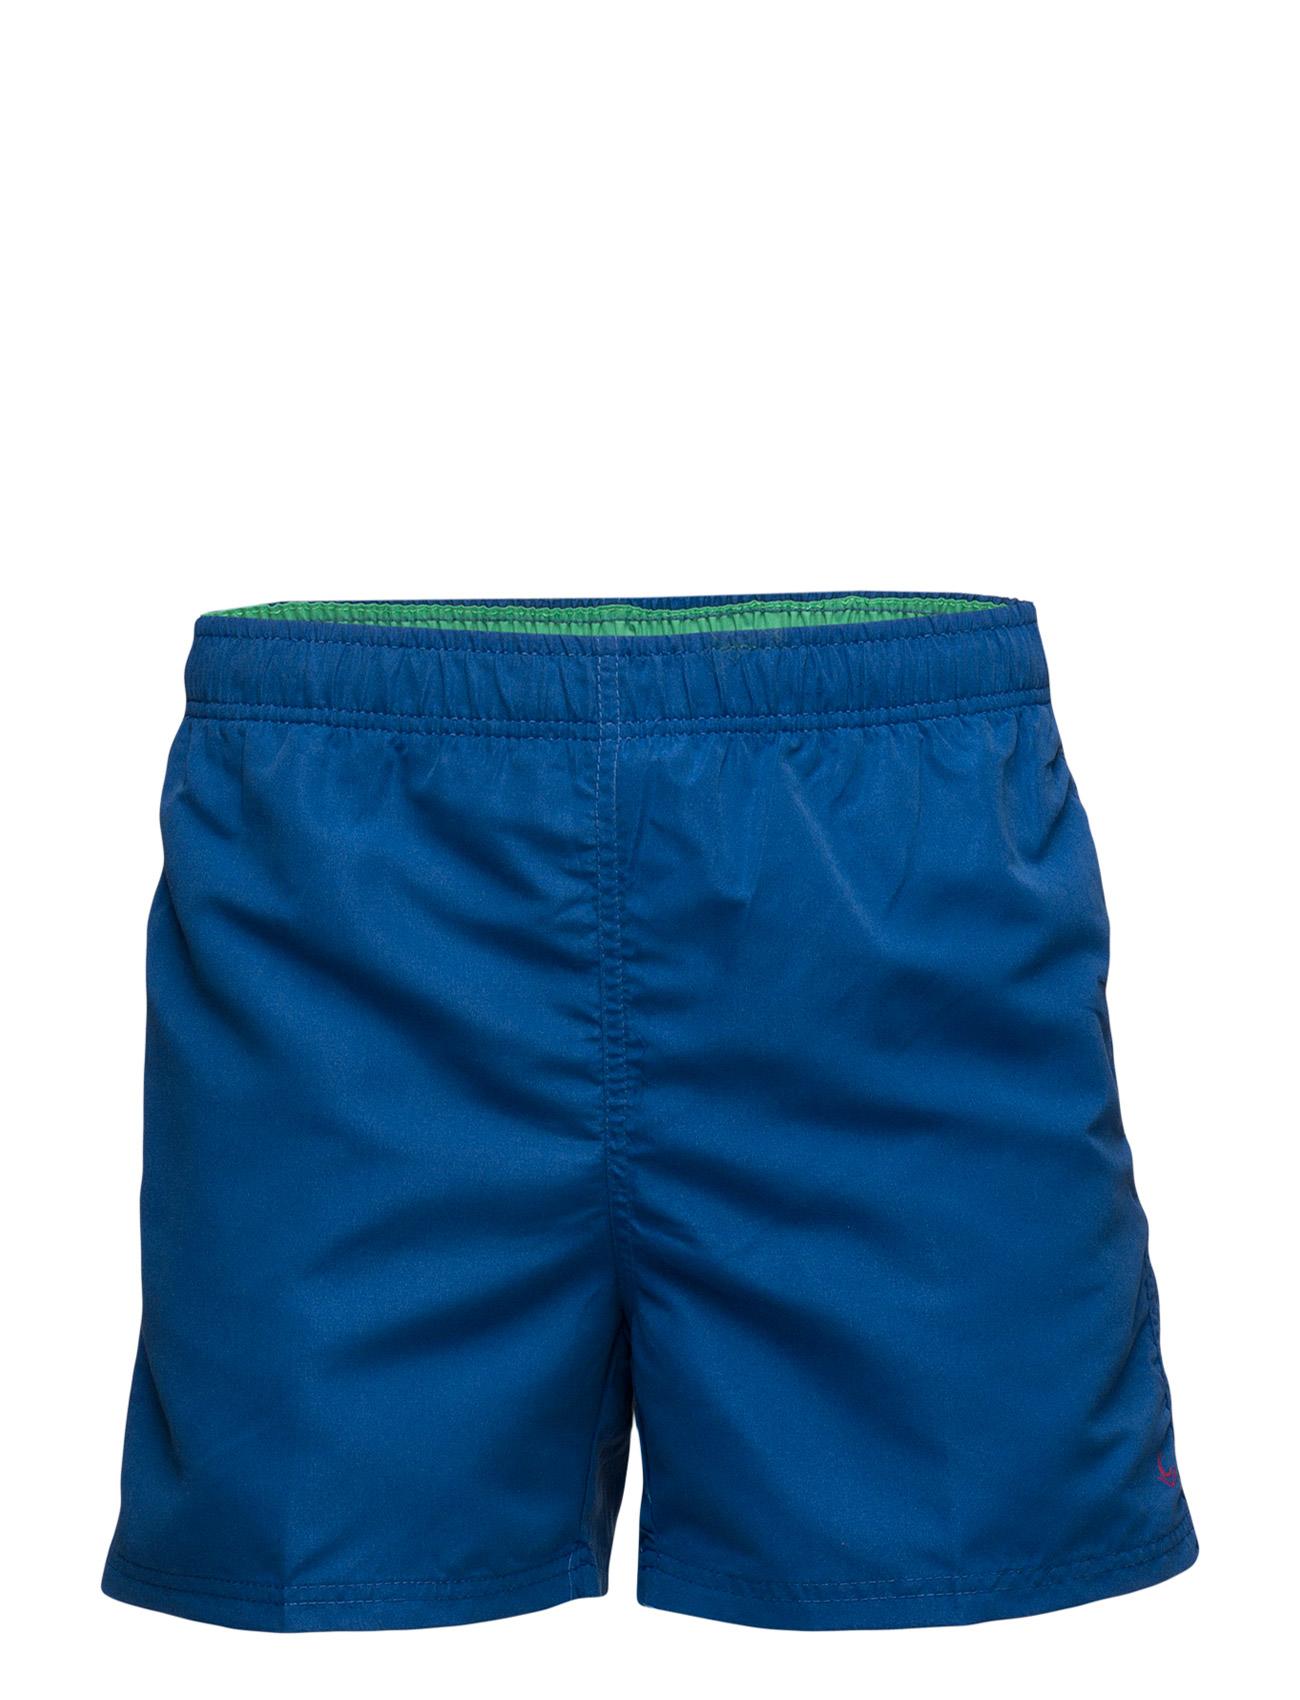 Men'S Swimshort, Short Model Claudio Shorts til Mænd i Blå